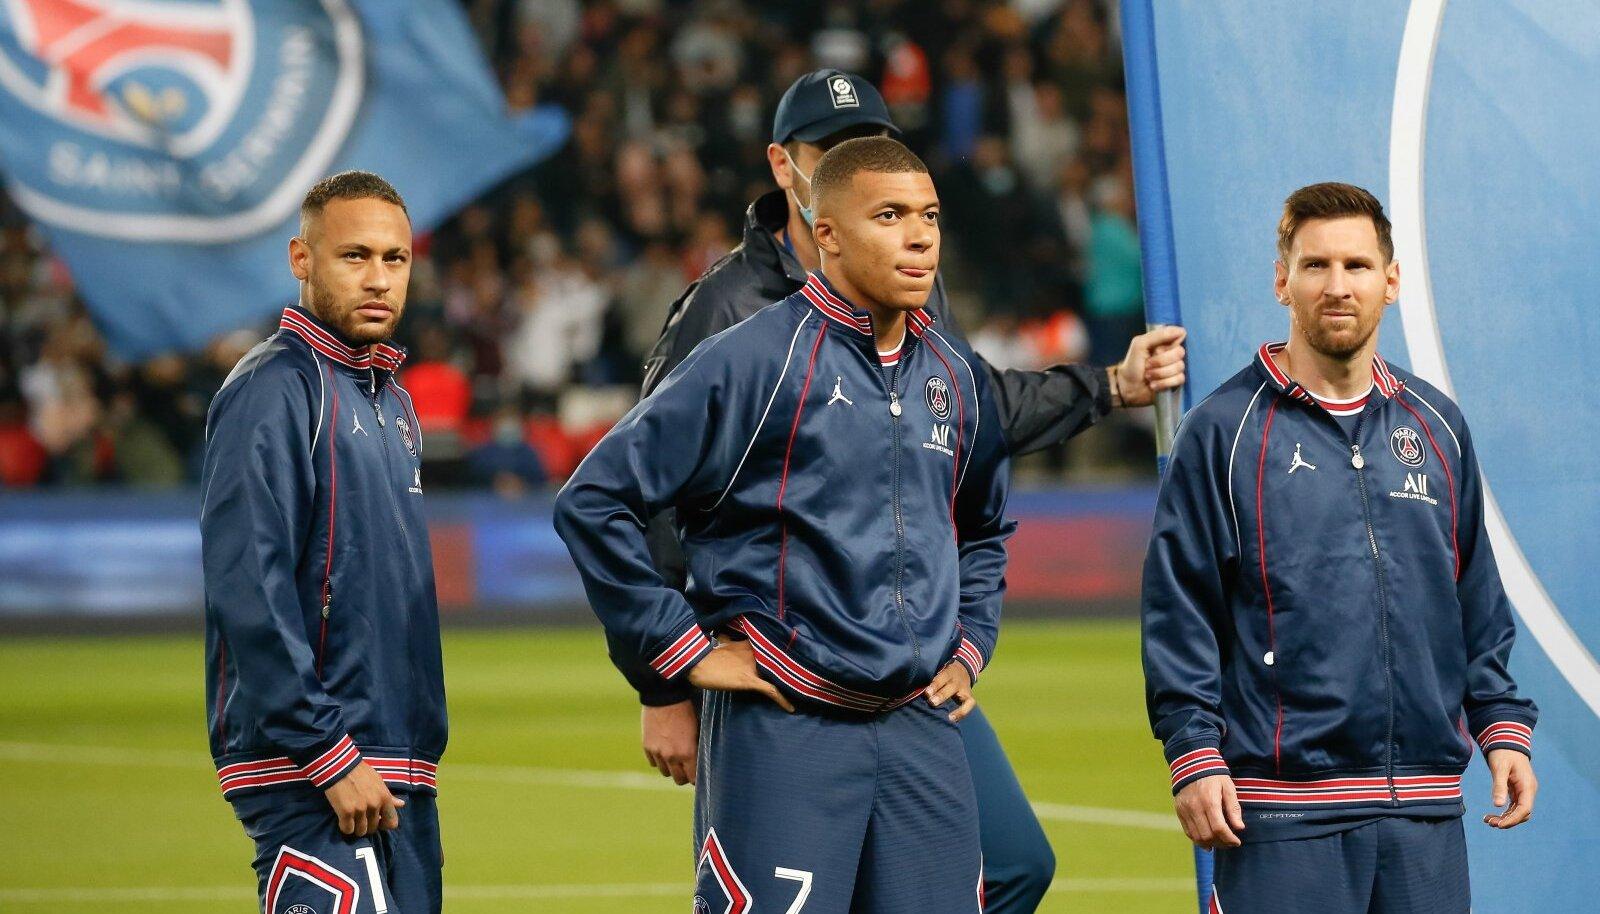 Neymar, Kylian Mbappé ja Lionel Messi